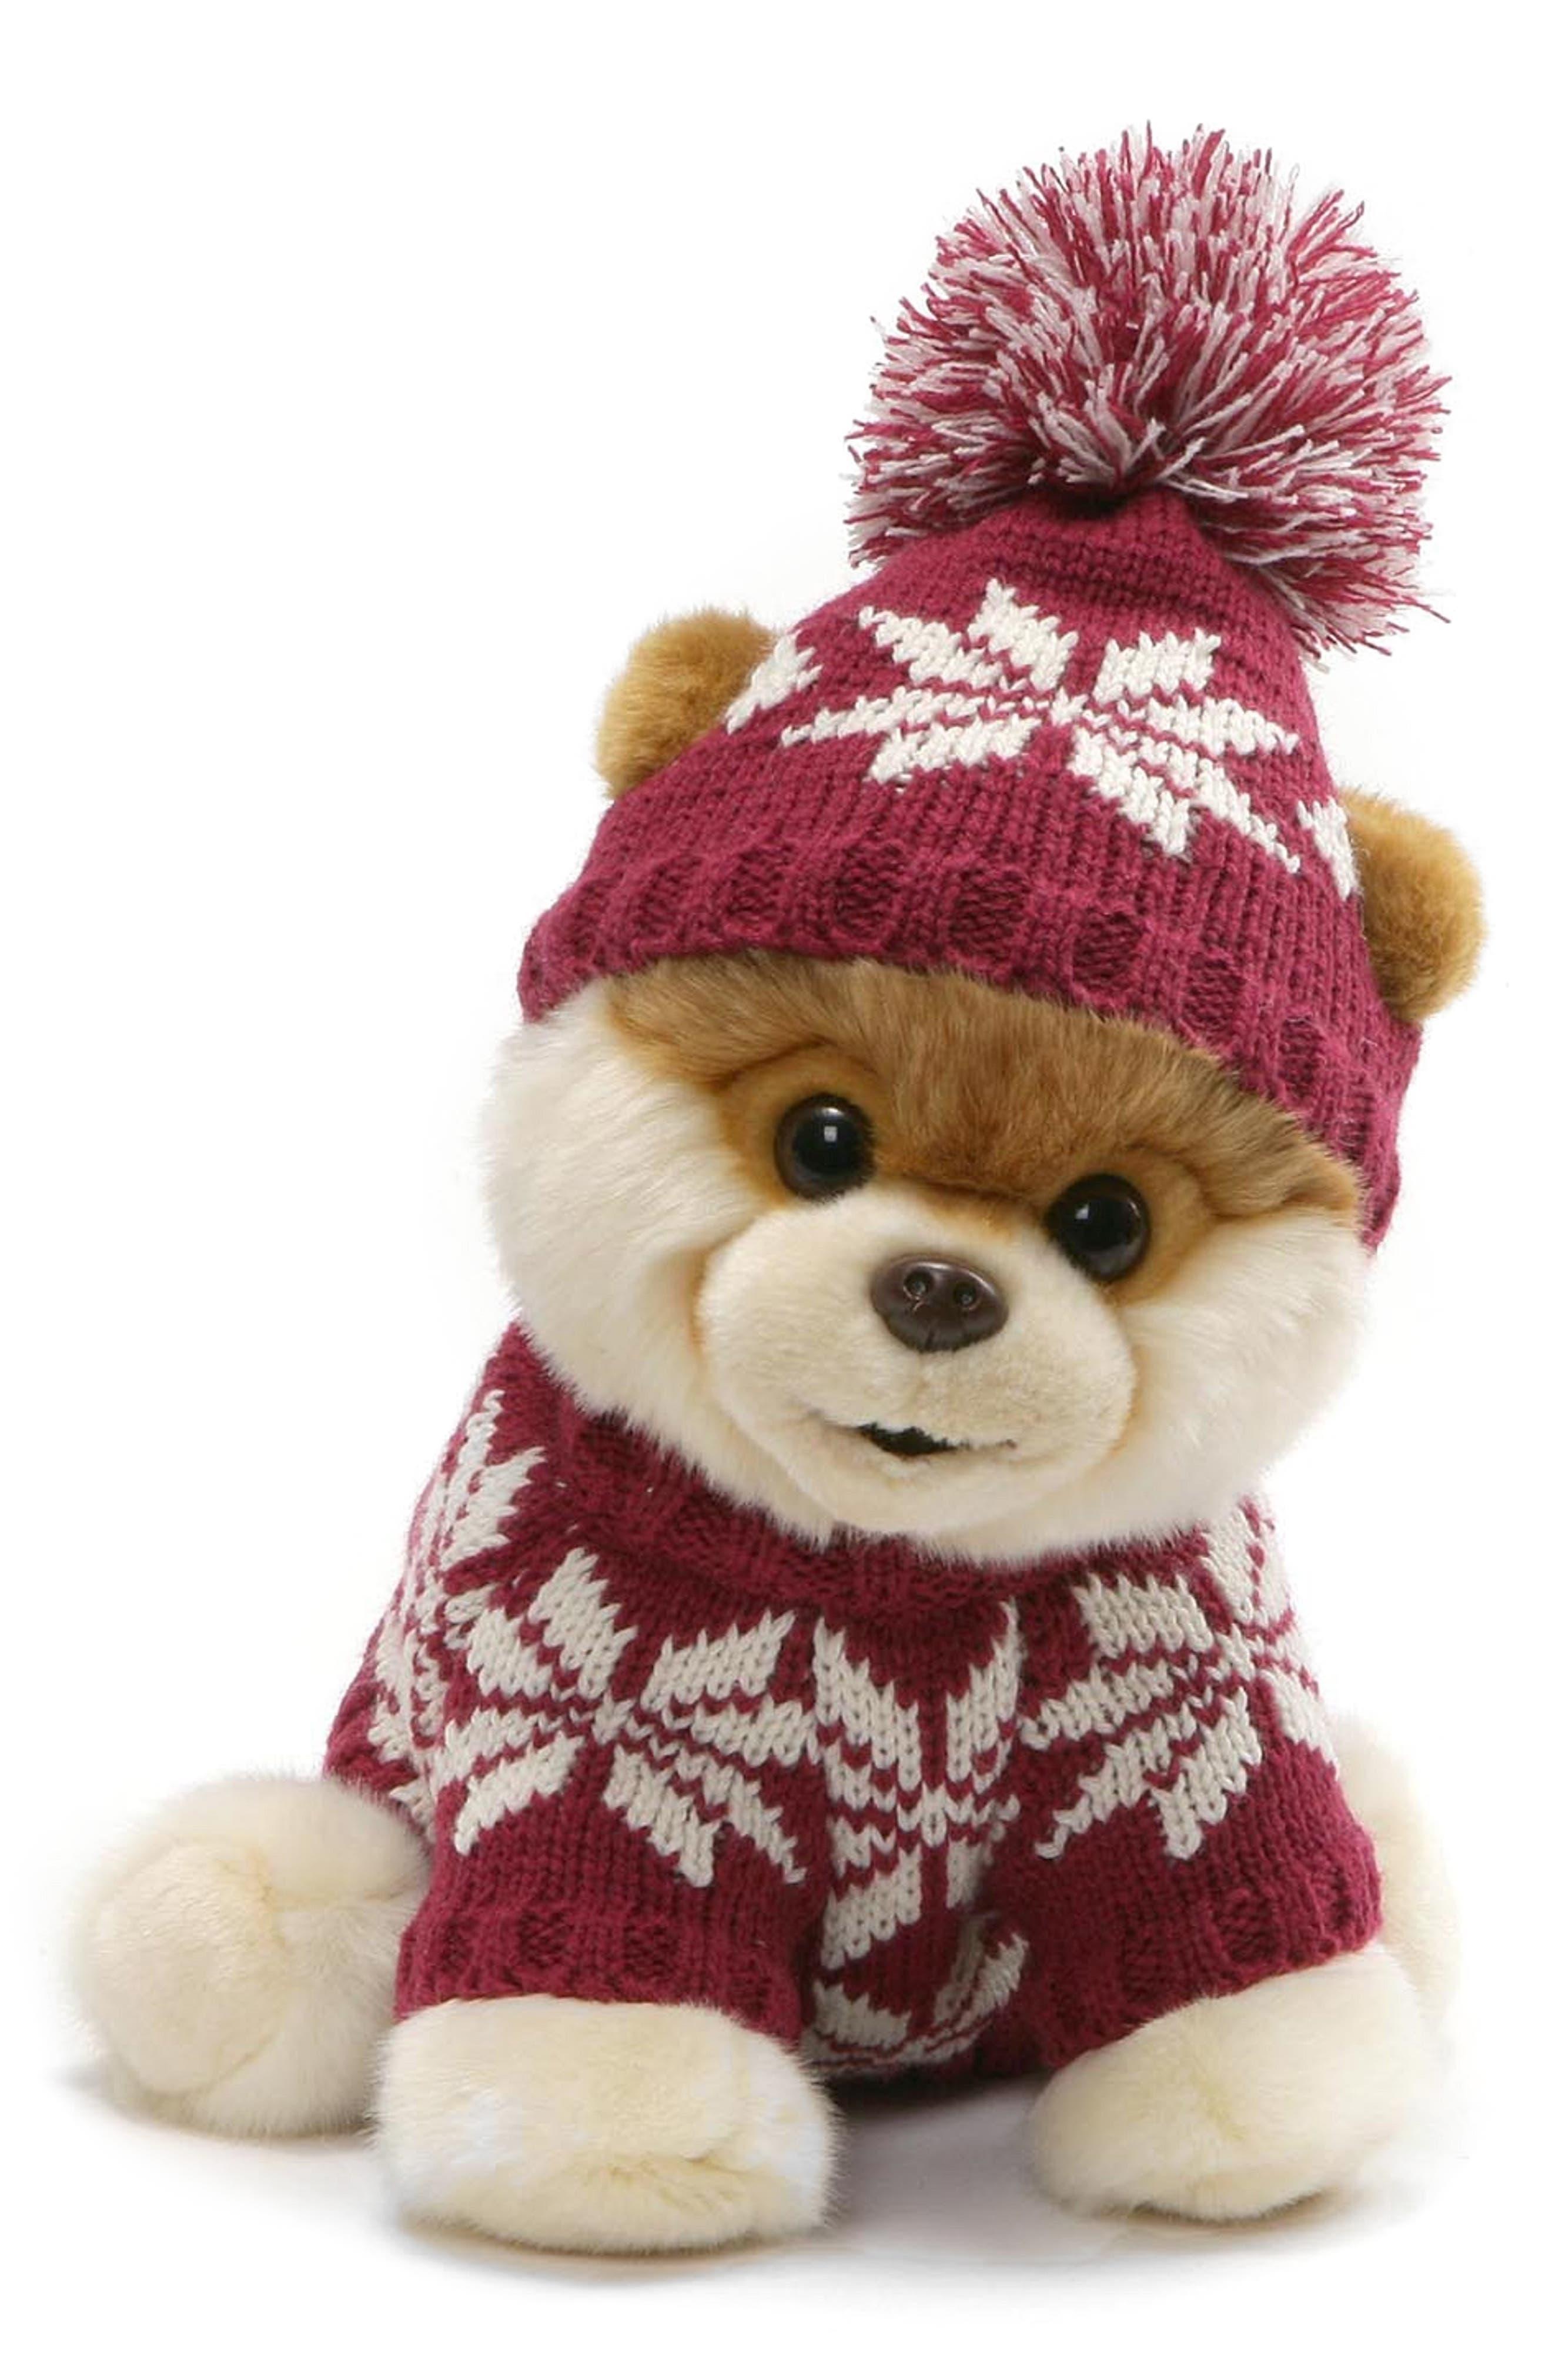 GUND Boo - Fair Isle Sweater Stuffed Animal, Main, color, 200